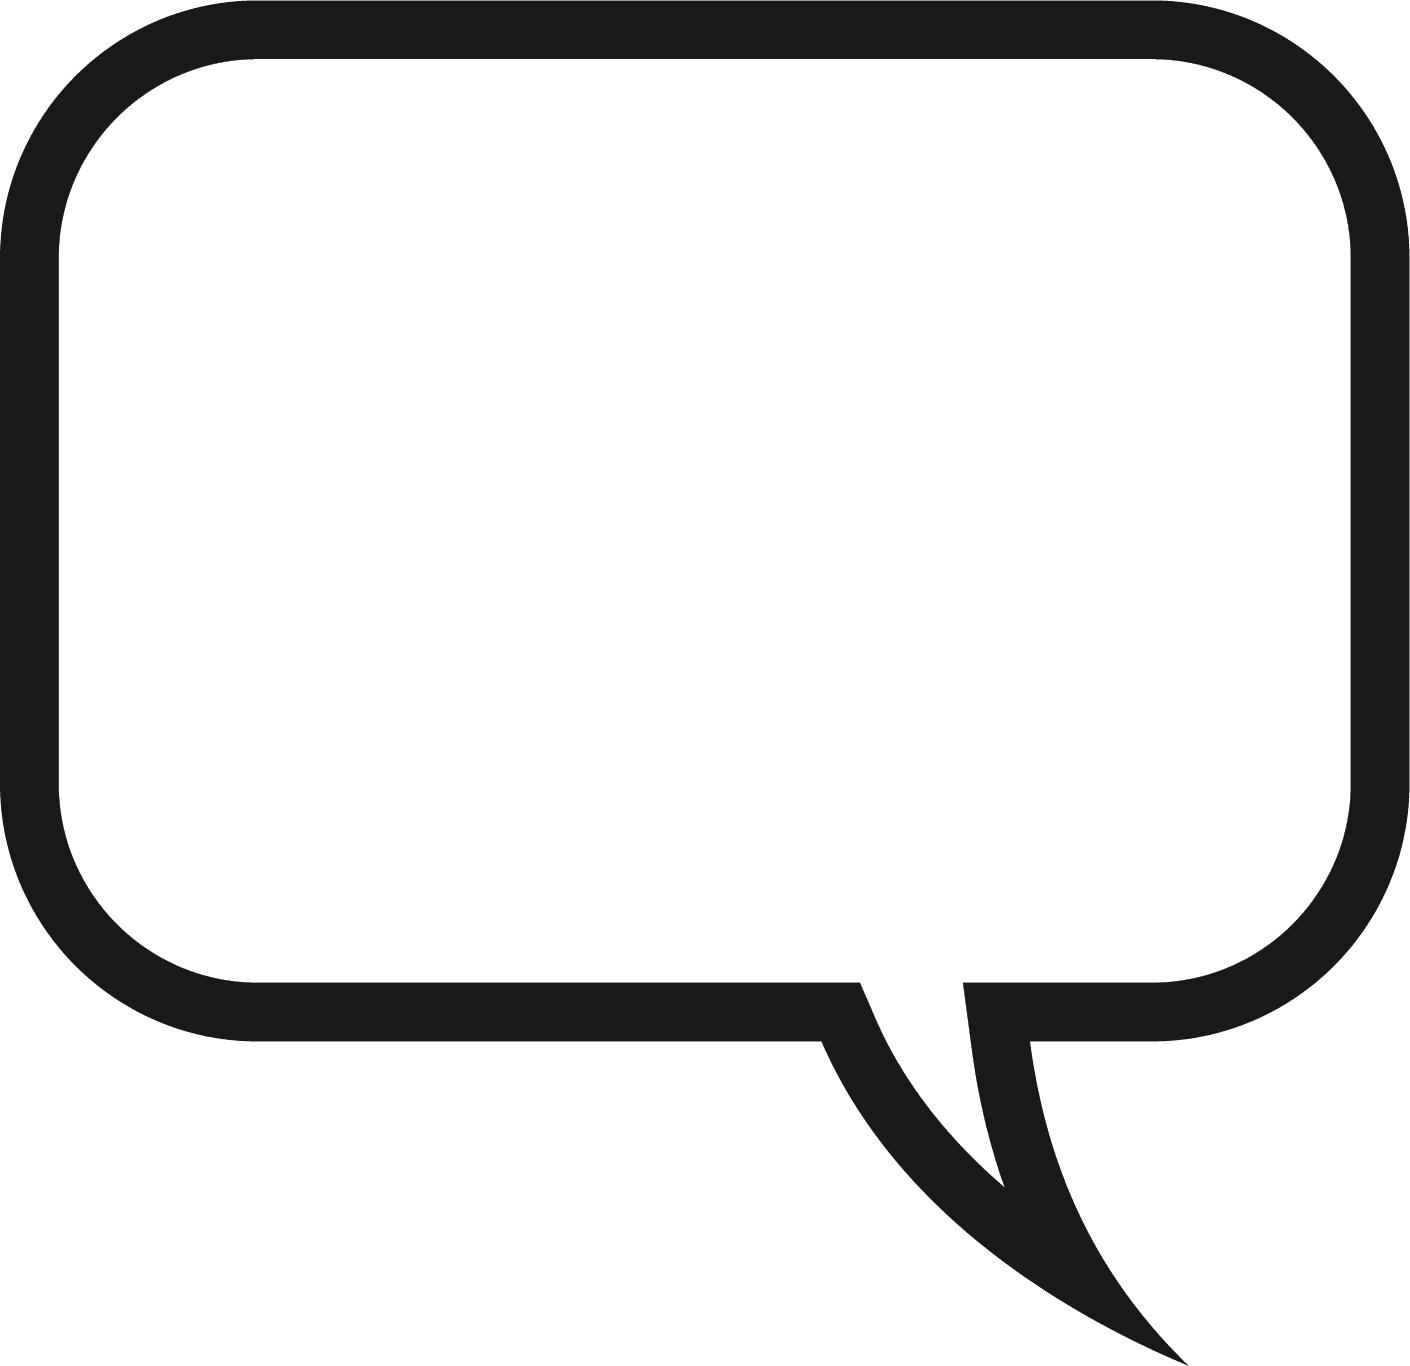 1410x1366 Speech Bubble Clipart